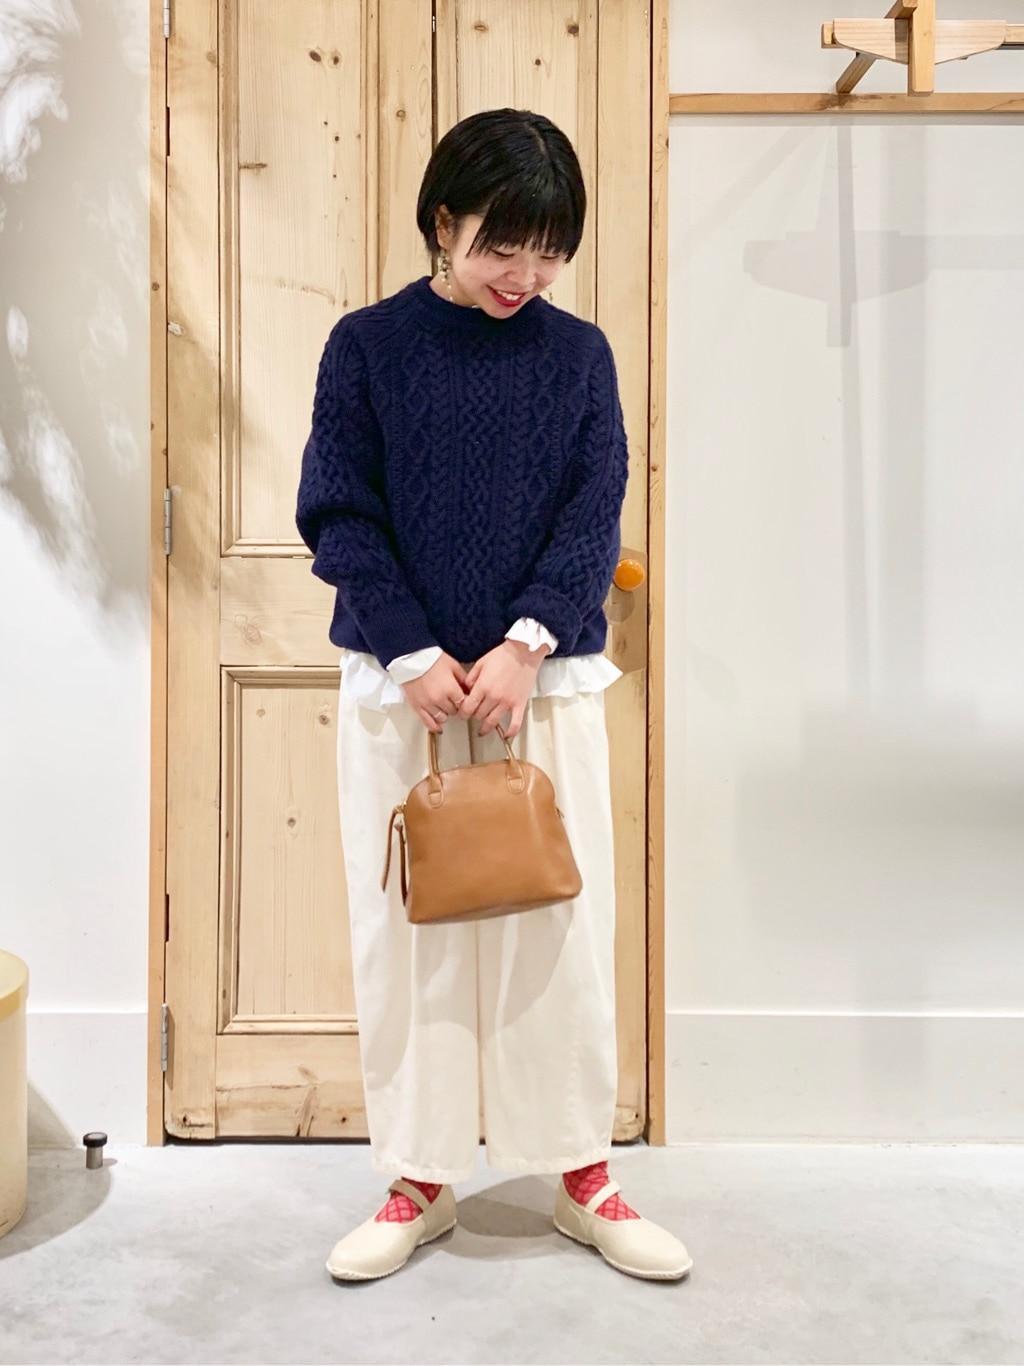 Malle chambre de charme 調布パルコ 身長:153cm 2020.10.16